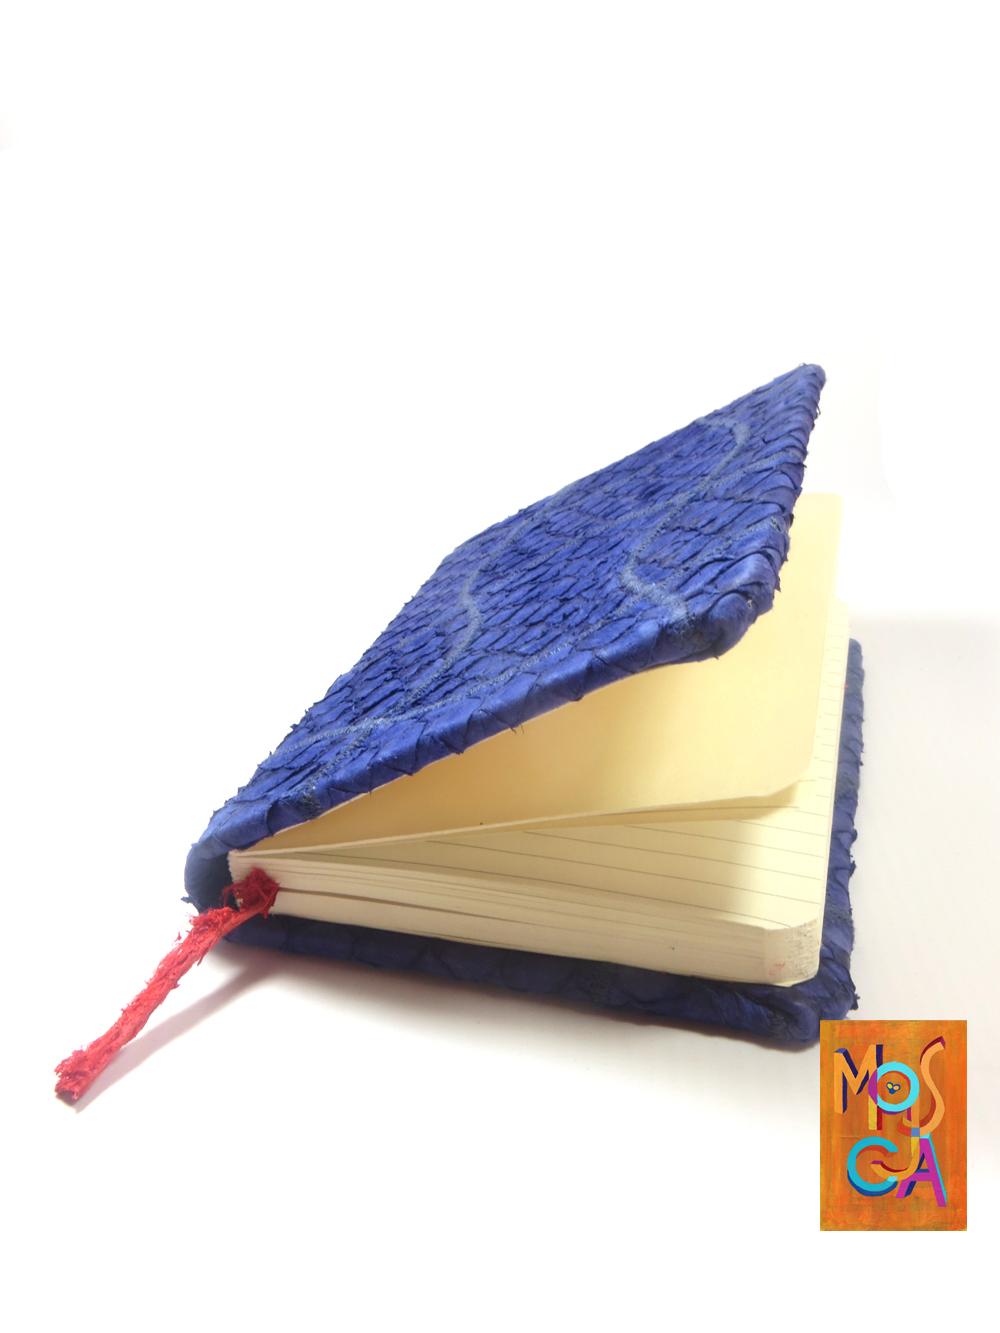 caderno violeta02 MOSCA.jpg